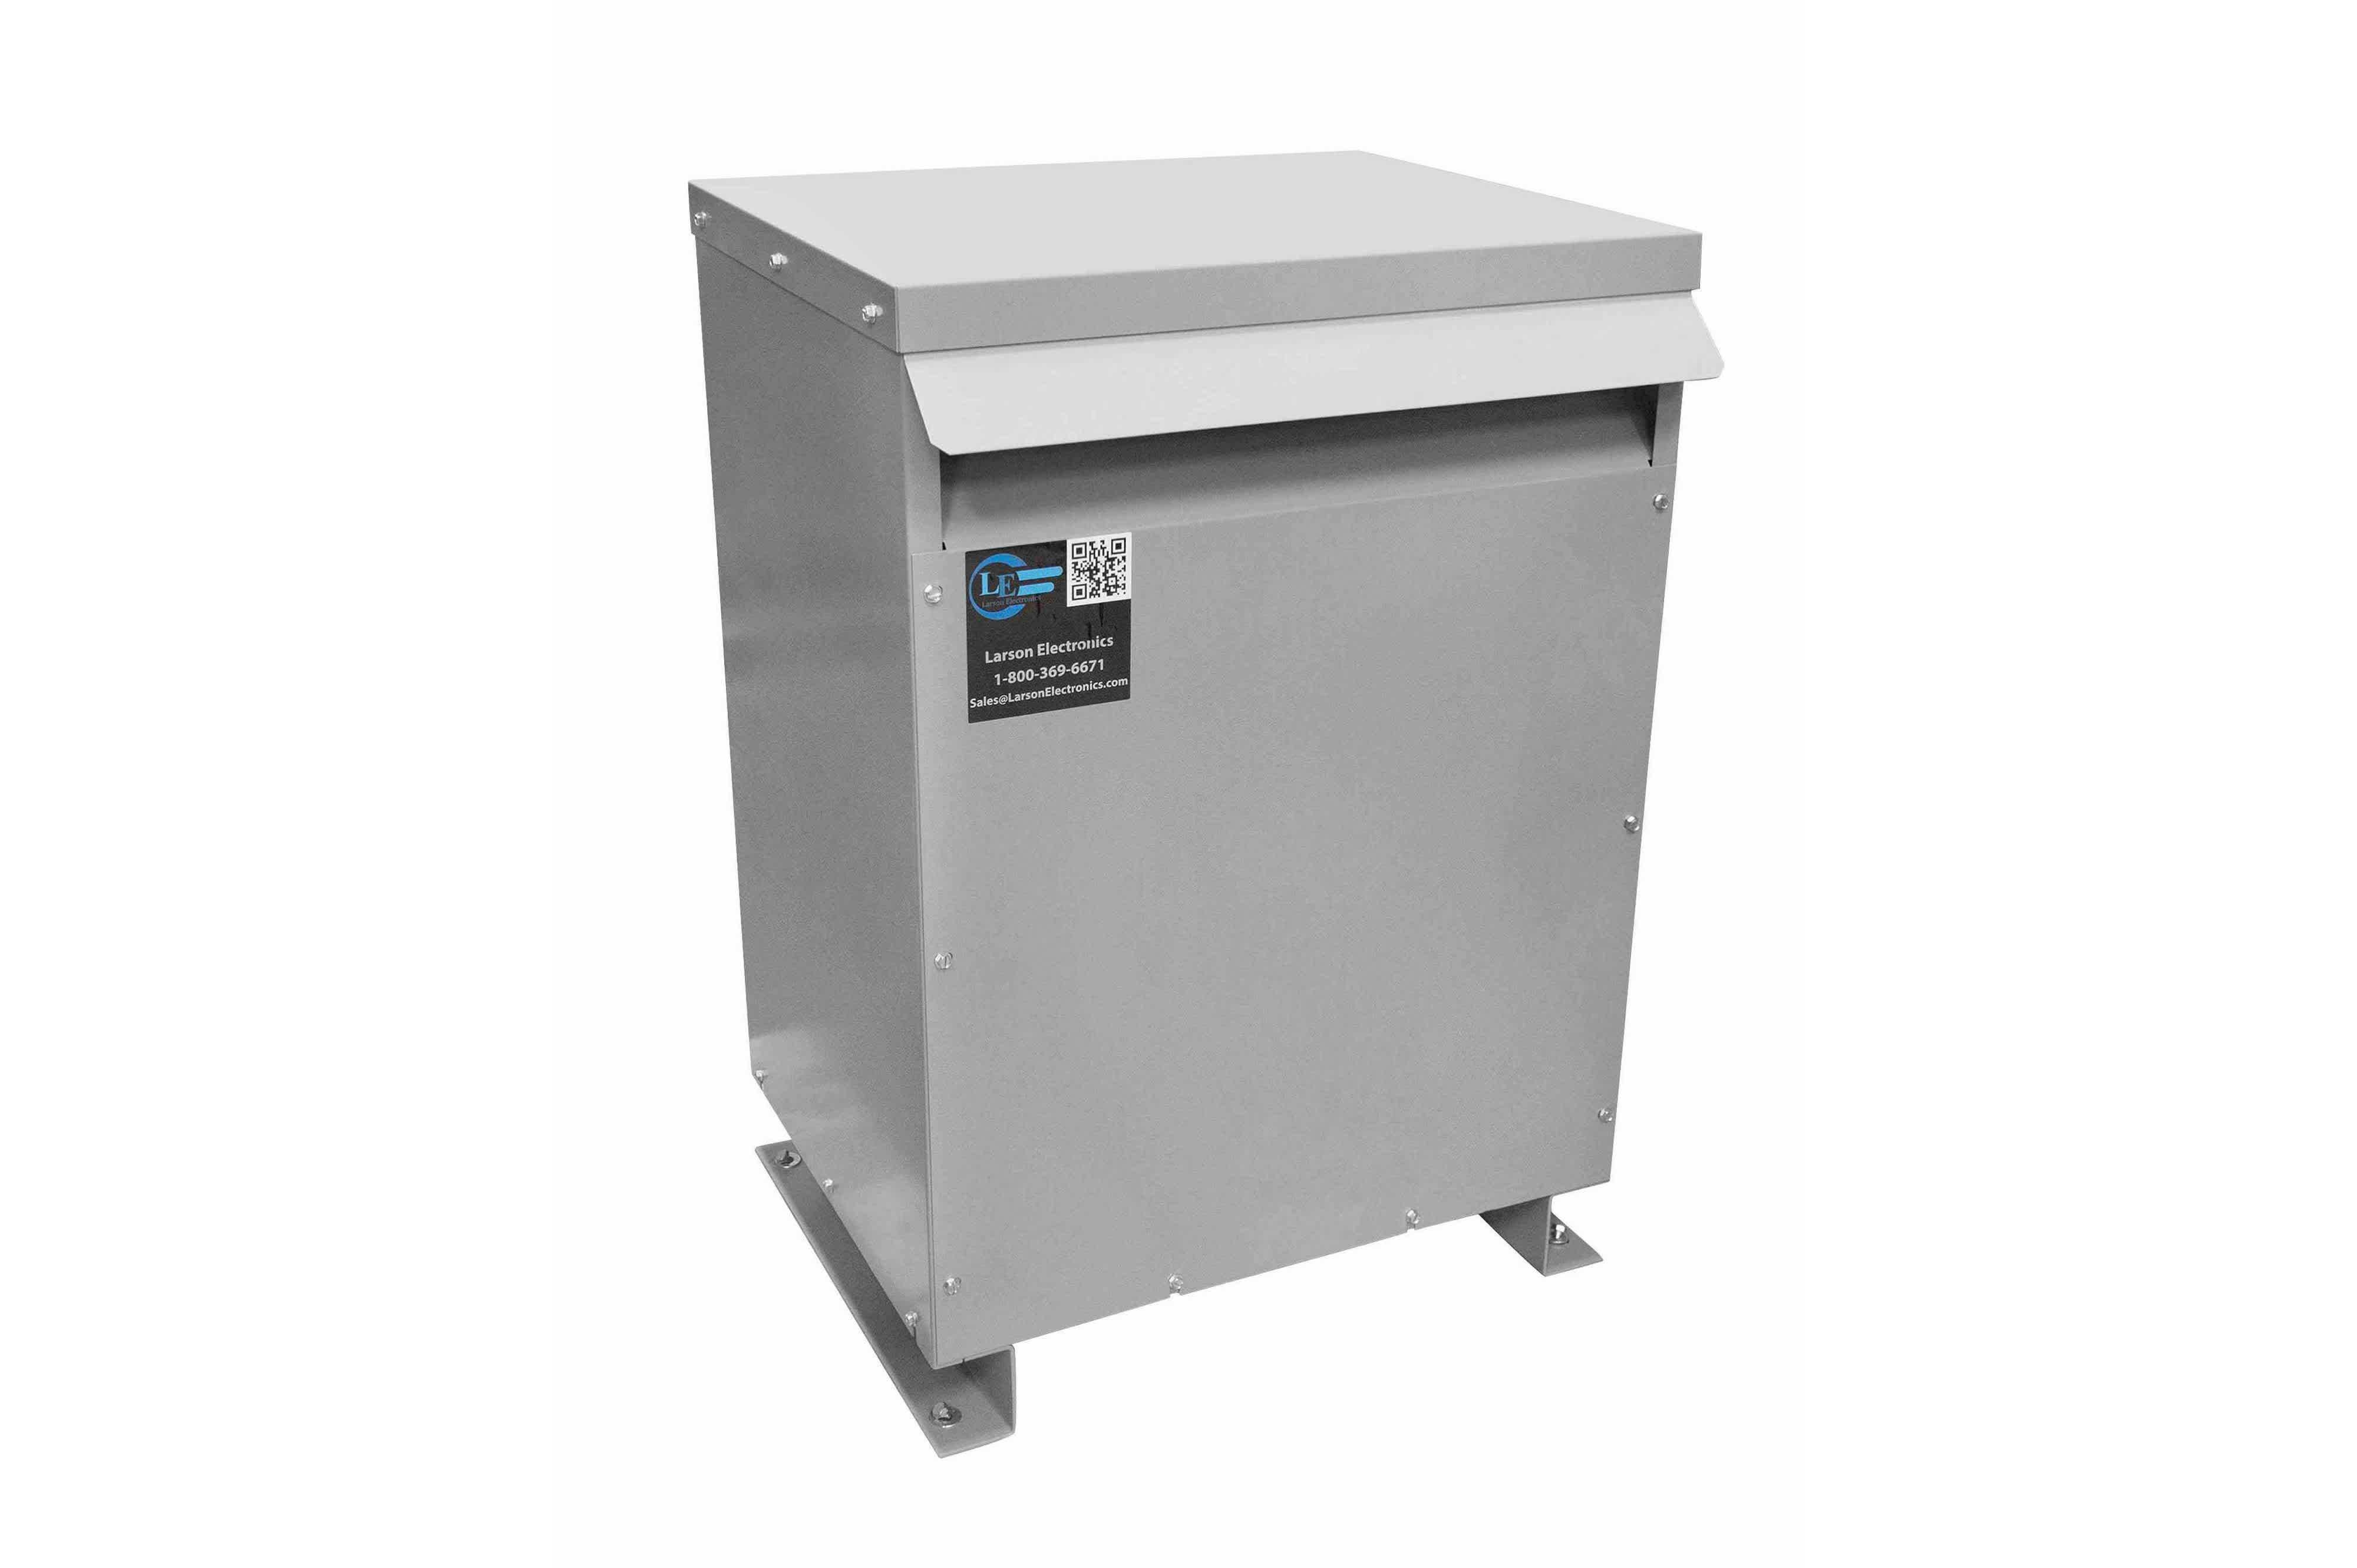 115 kVA 3PH Isolation Transformer, 220V Wye Primary, 208V Delta Secondary, N3R, Ventilated, 60 Hz